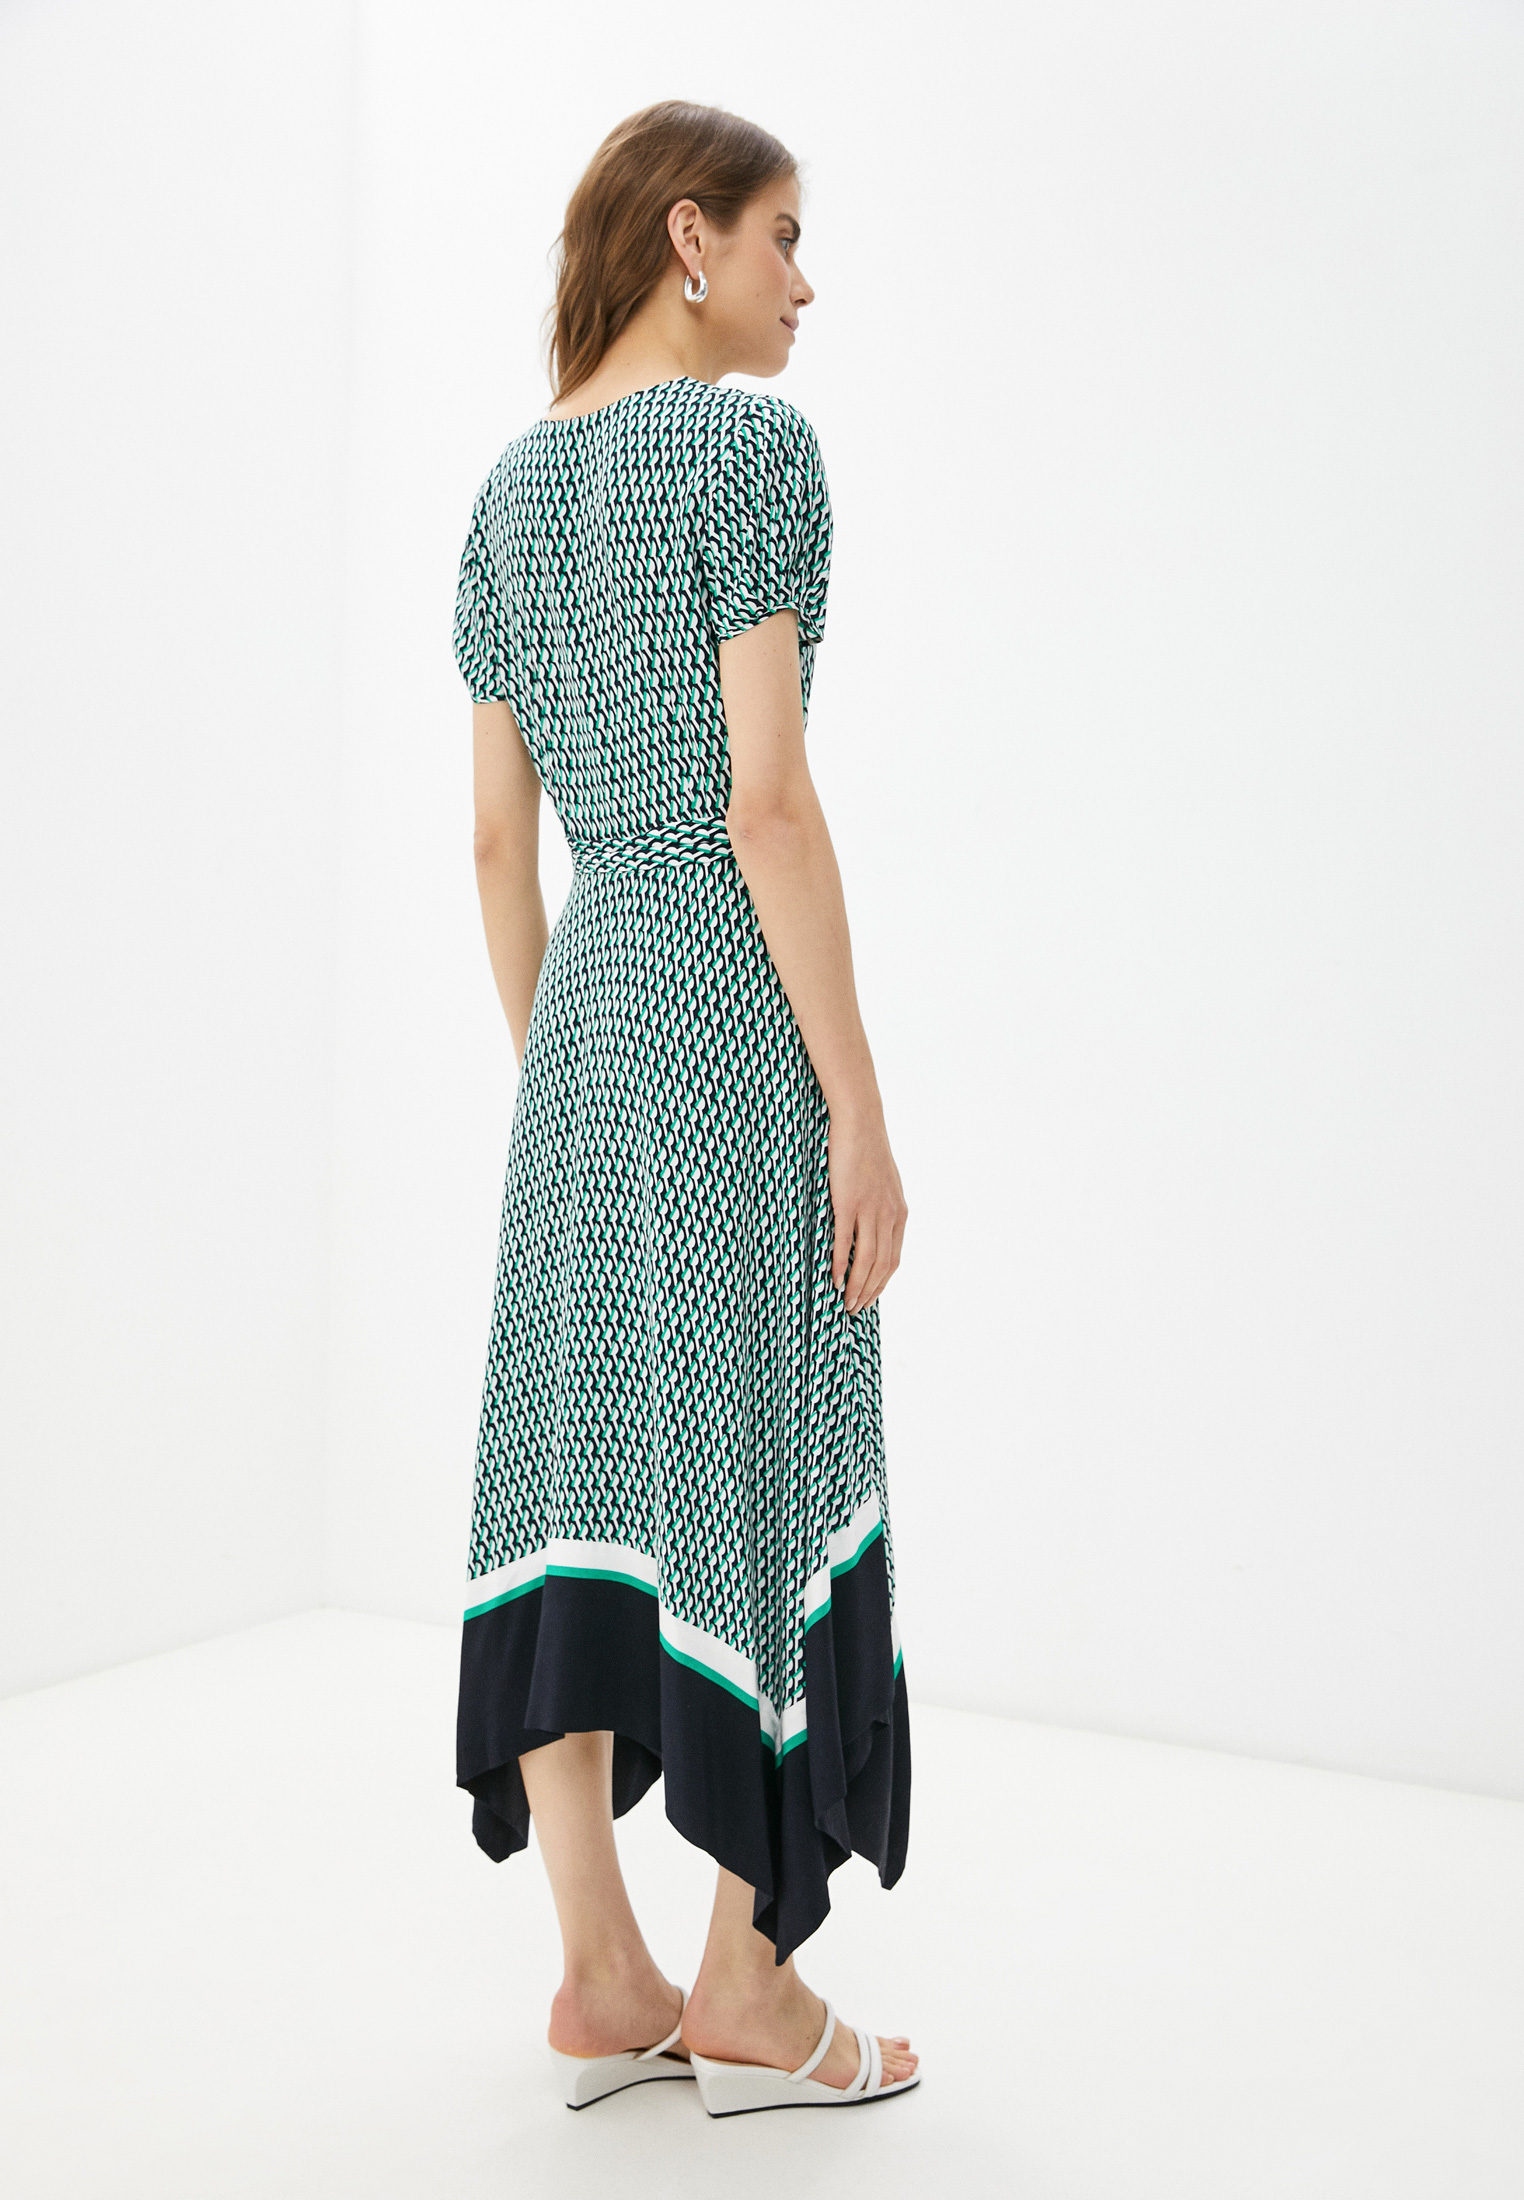 Платье Tommy Hilfiger (Томми Хилфигер) WW0WW30330: изображение 3